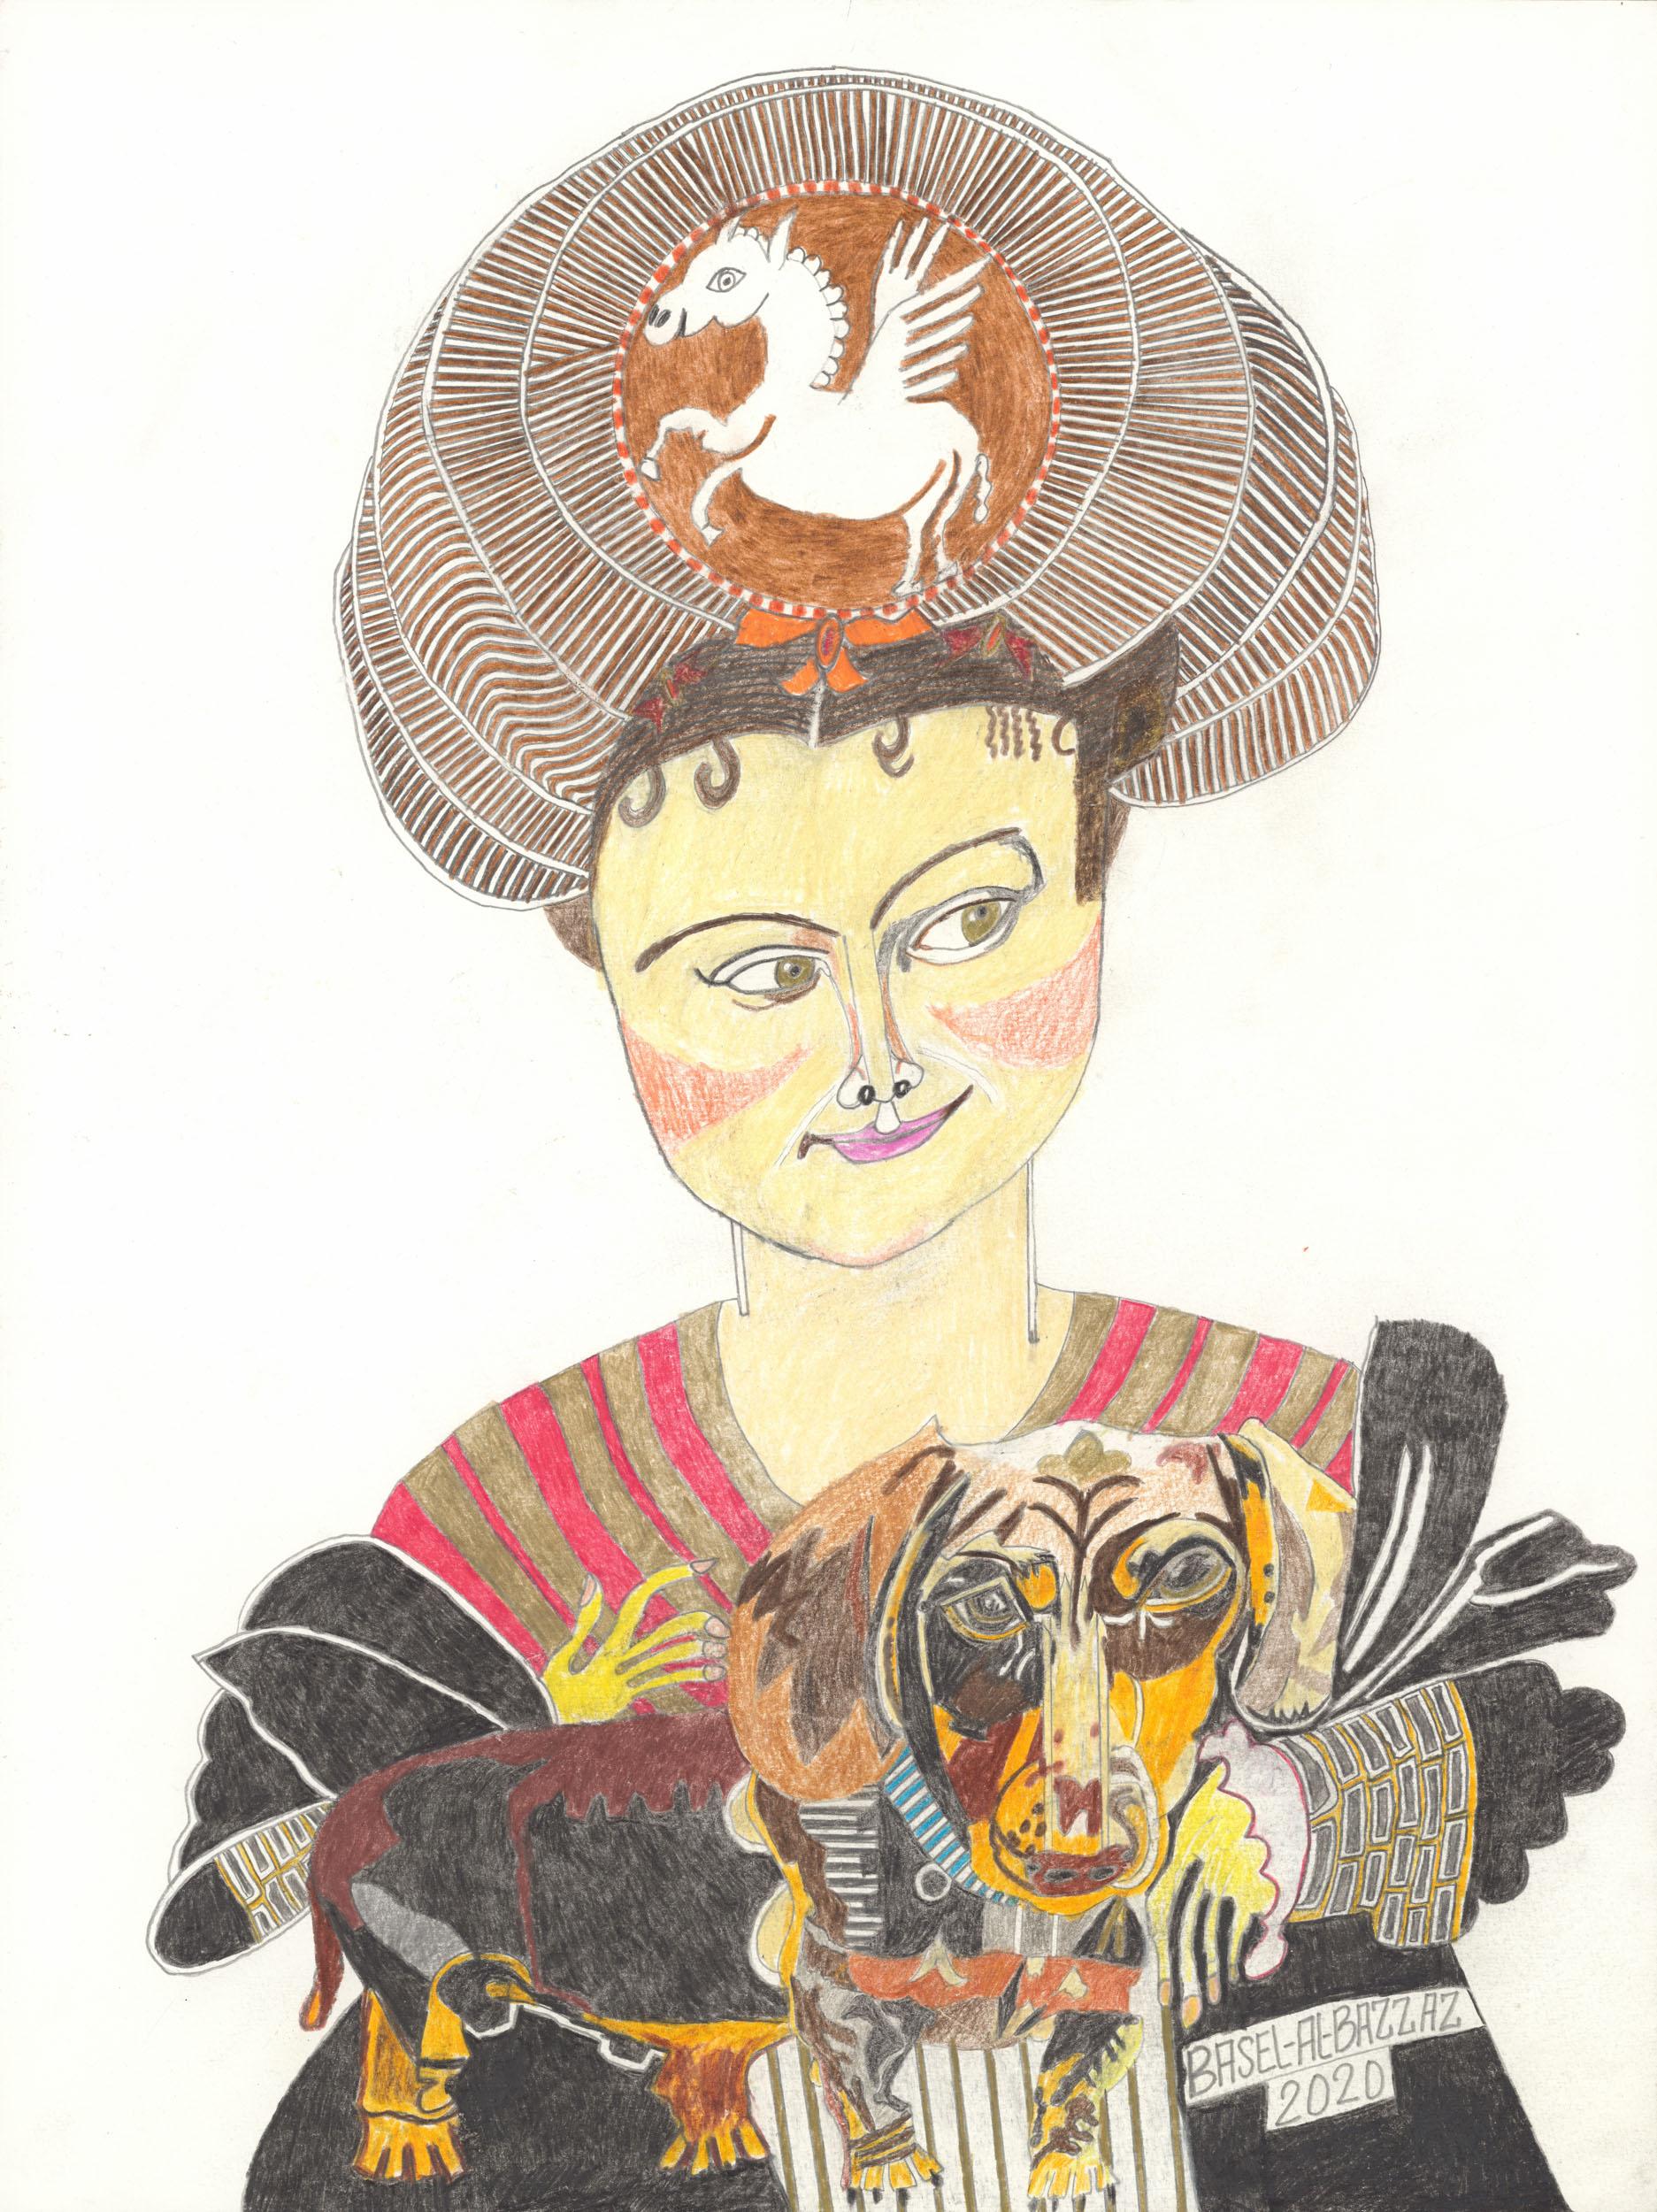 al-bazzaz basel - Prinzessin mit Dackel / Princess with dachshund